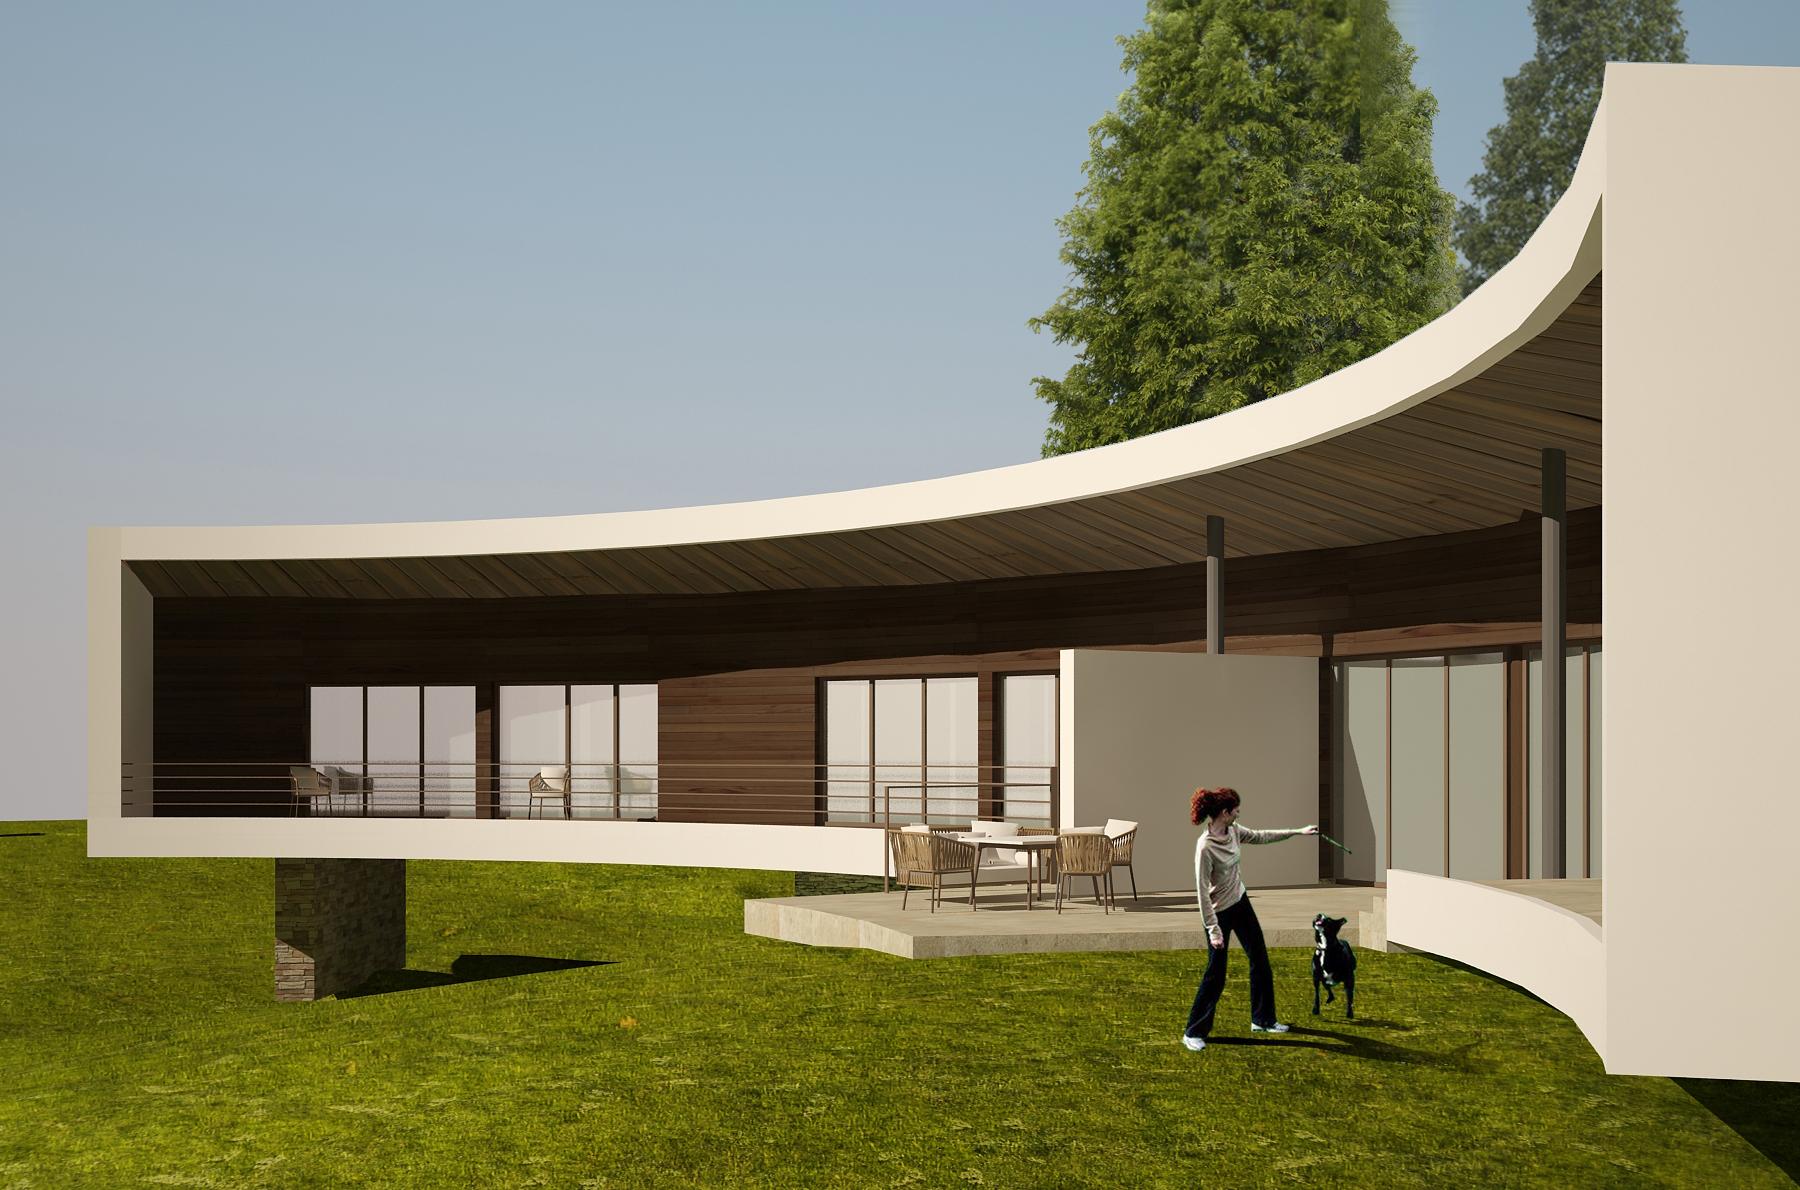 https://nbc-arhitect.ro/wp-content/uploads/2020/10/NBC-Arhitect-_-Breaza-House-_-Breaza-Romania-_-exterior-view_1.jpg